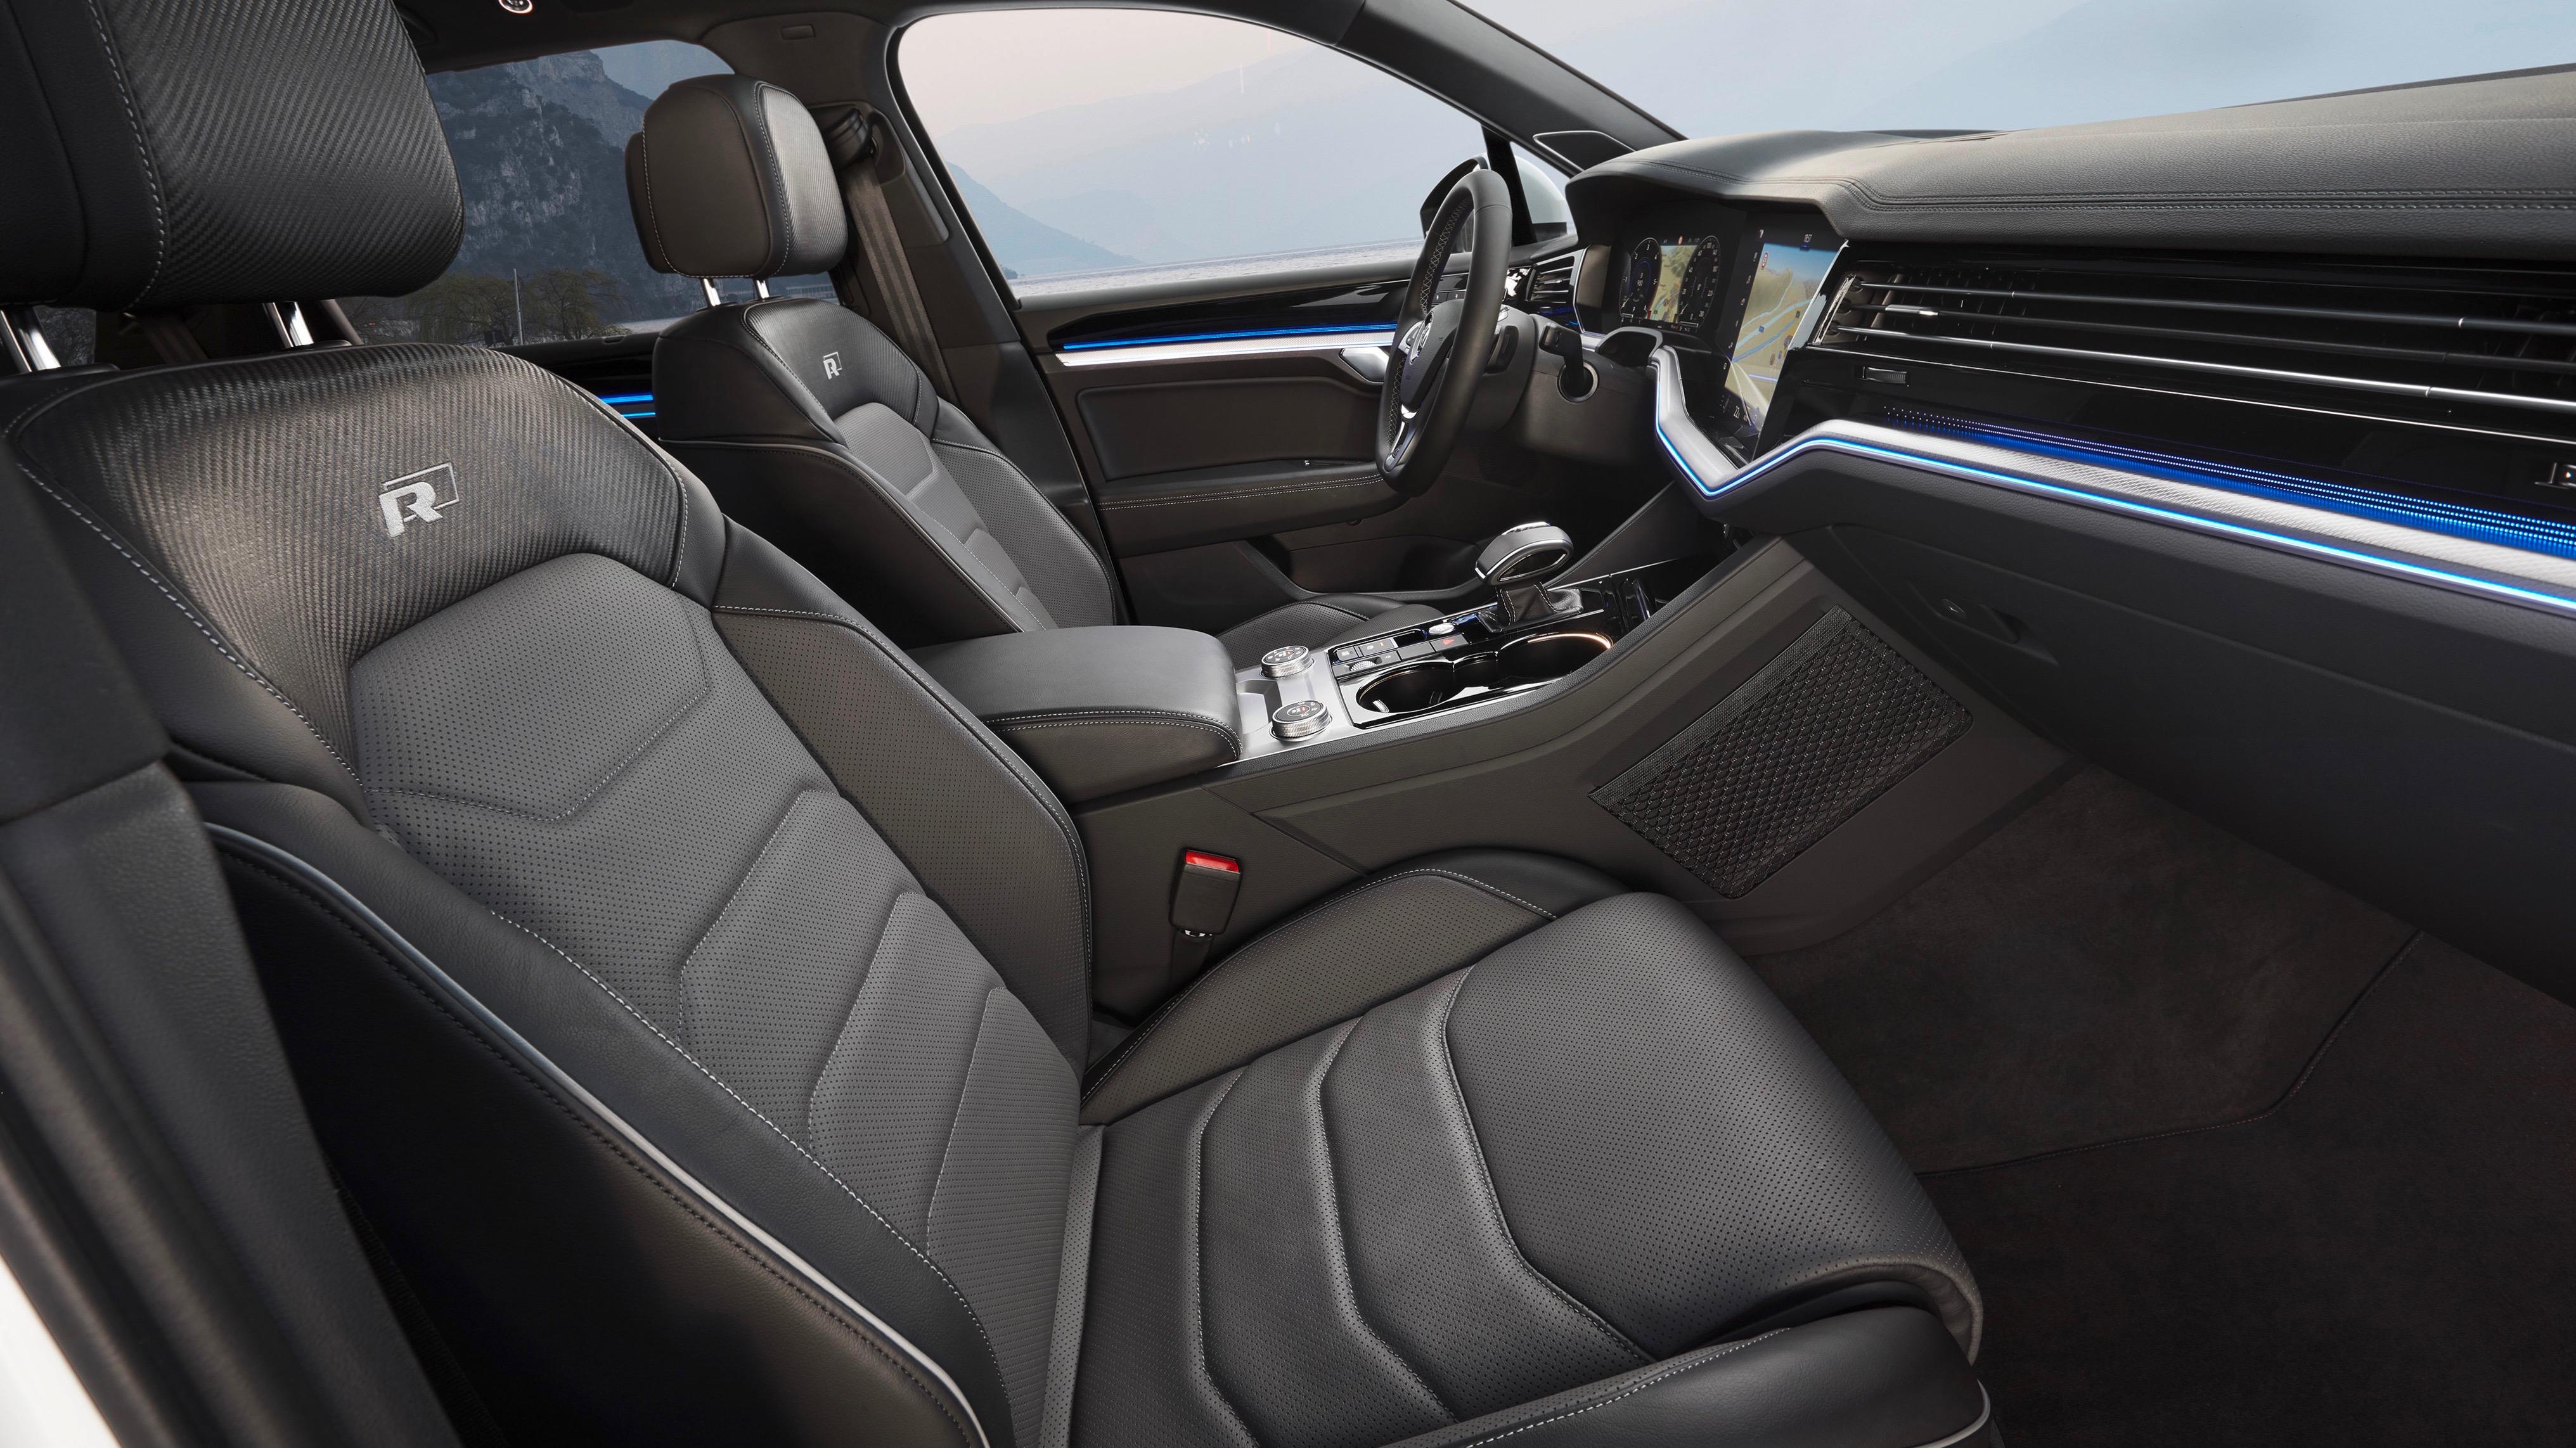 Volkswagen Touareg R-Line side view